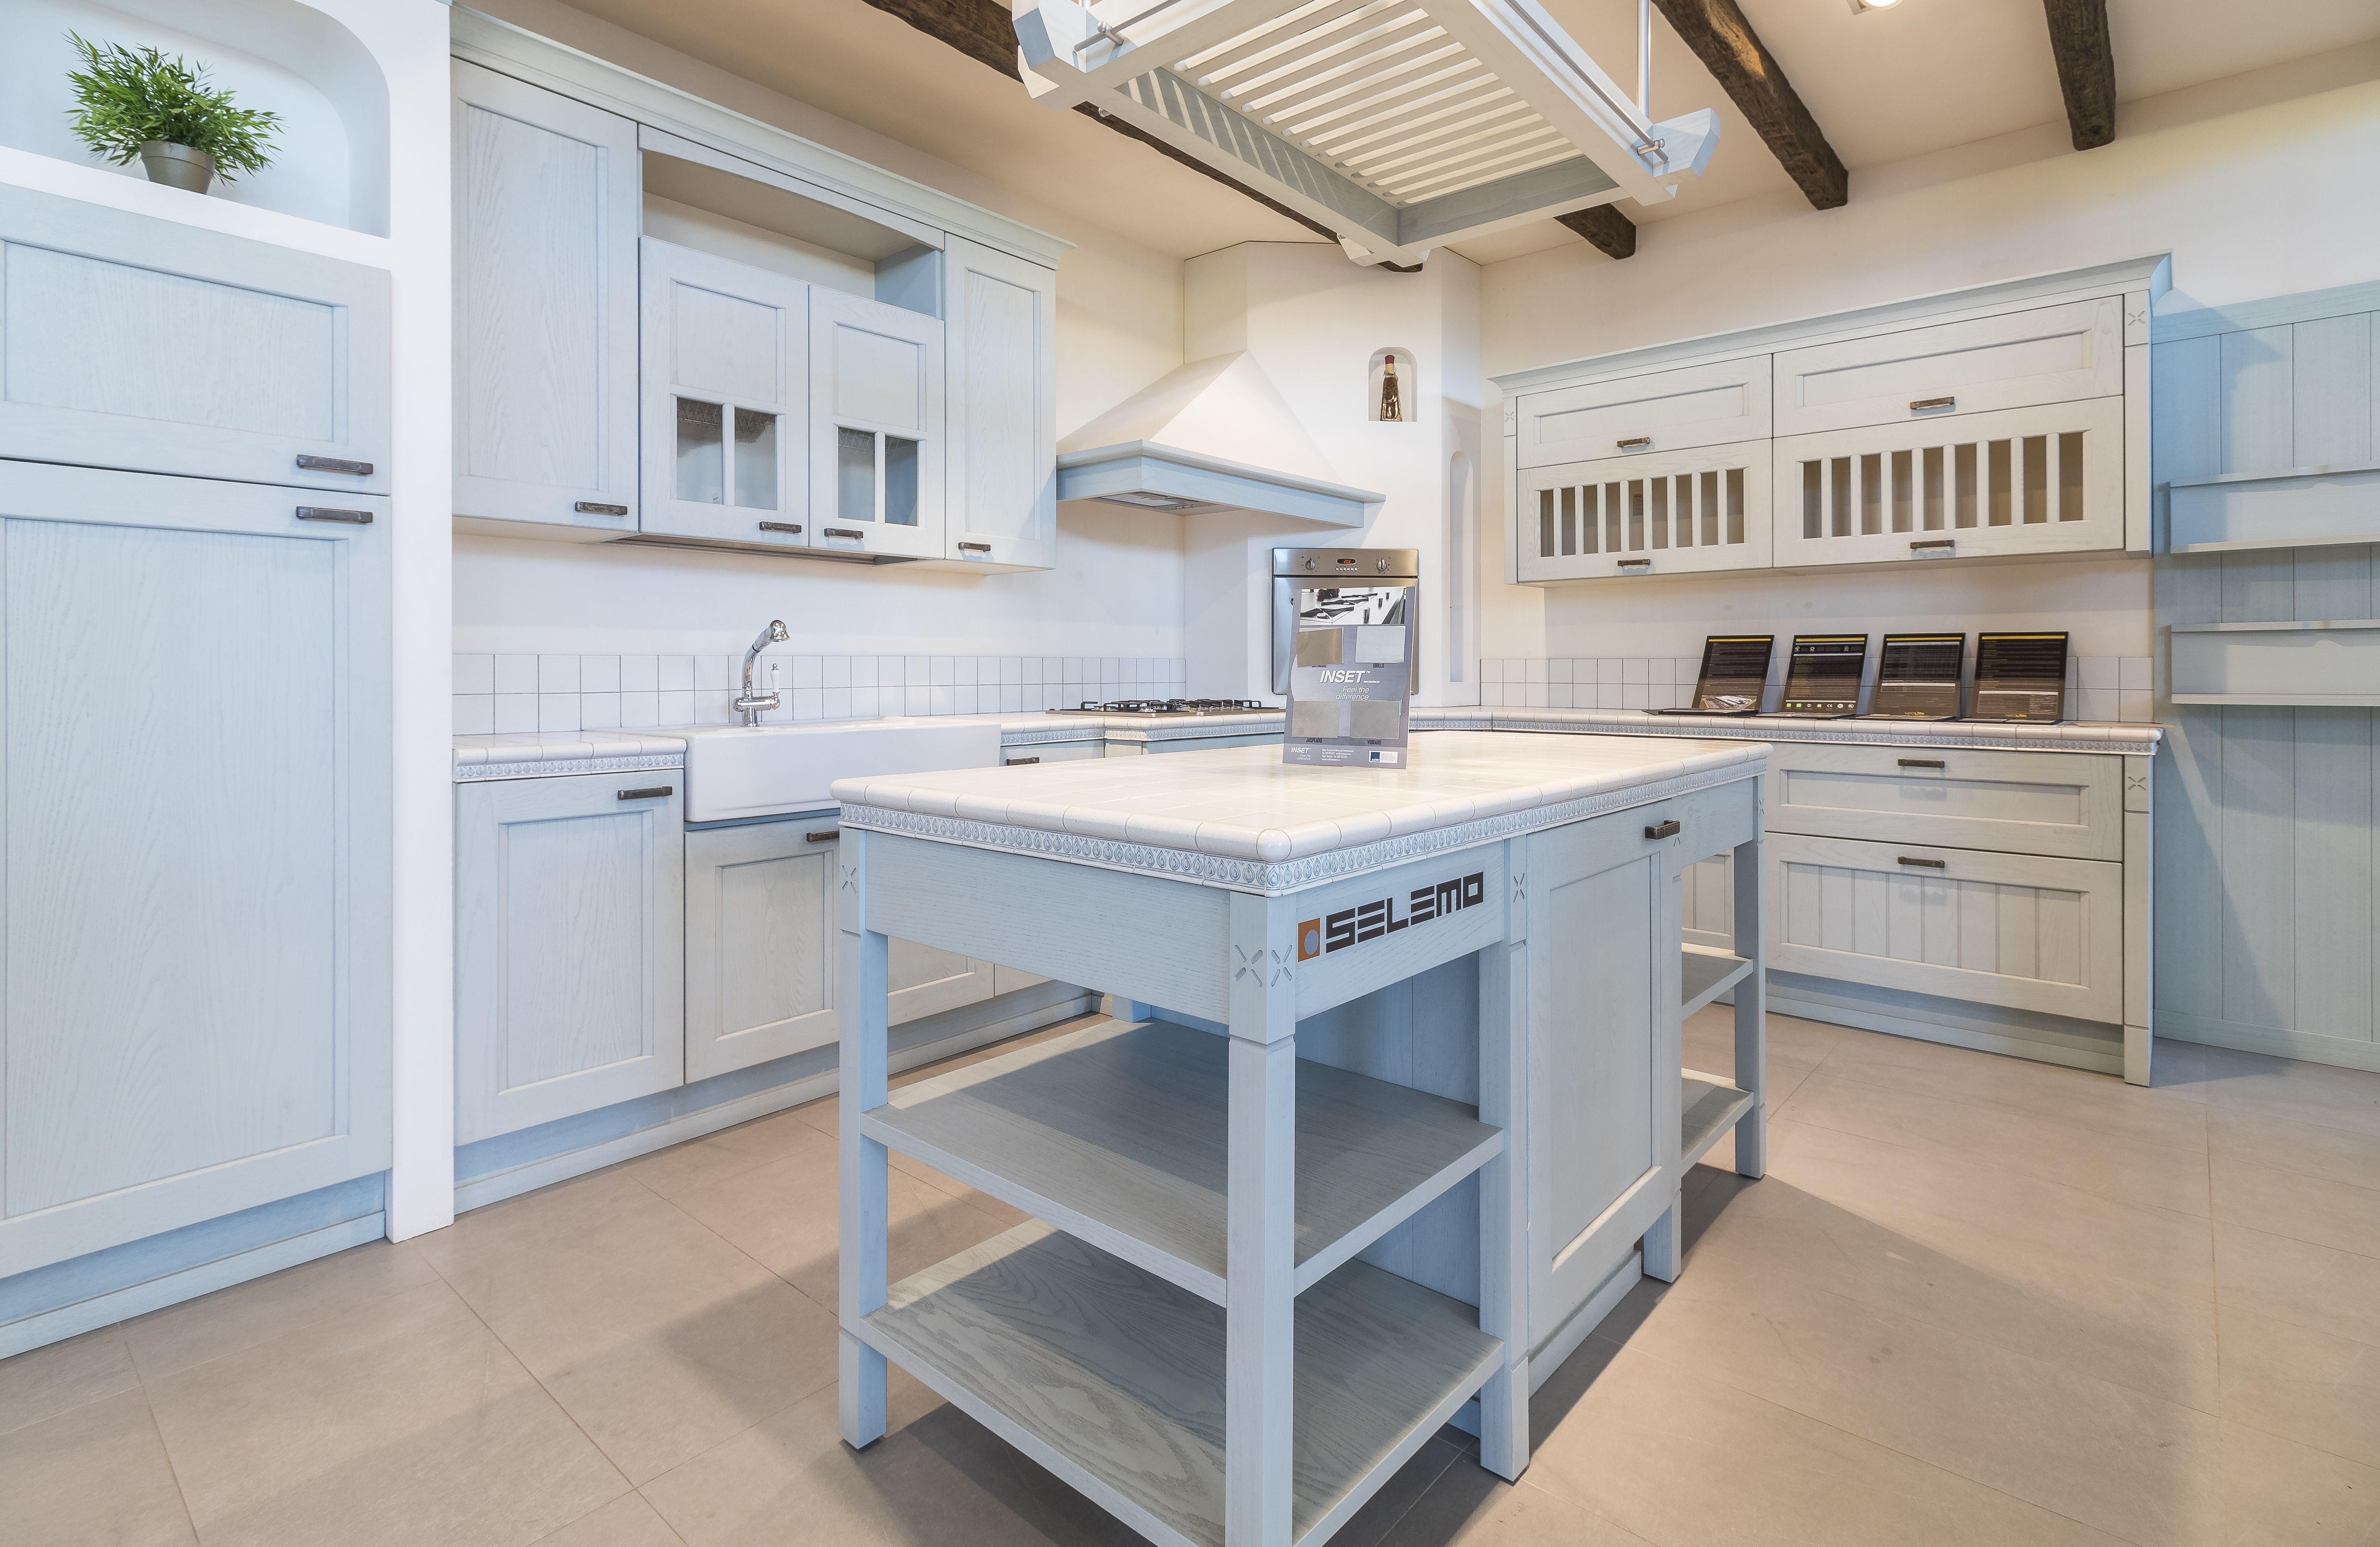 Muebles de cocina en murcia best cheap perfect - Muebles de cocina murcia ...